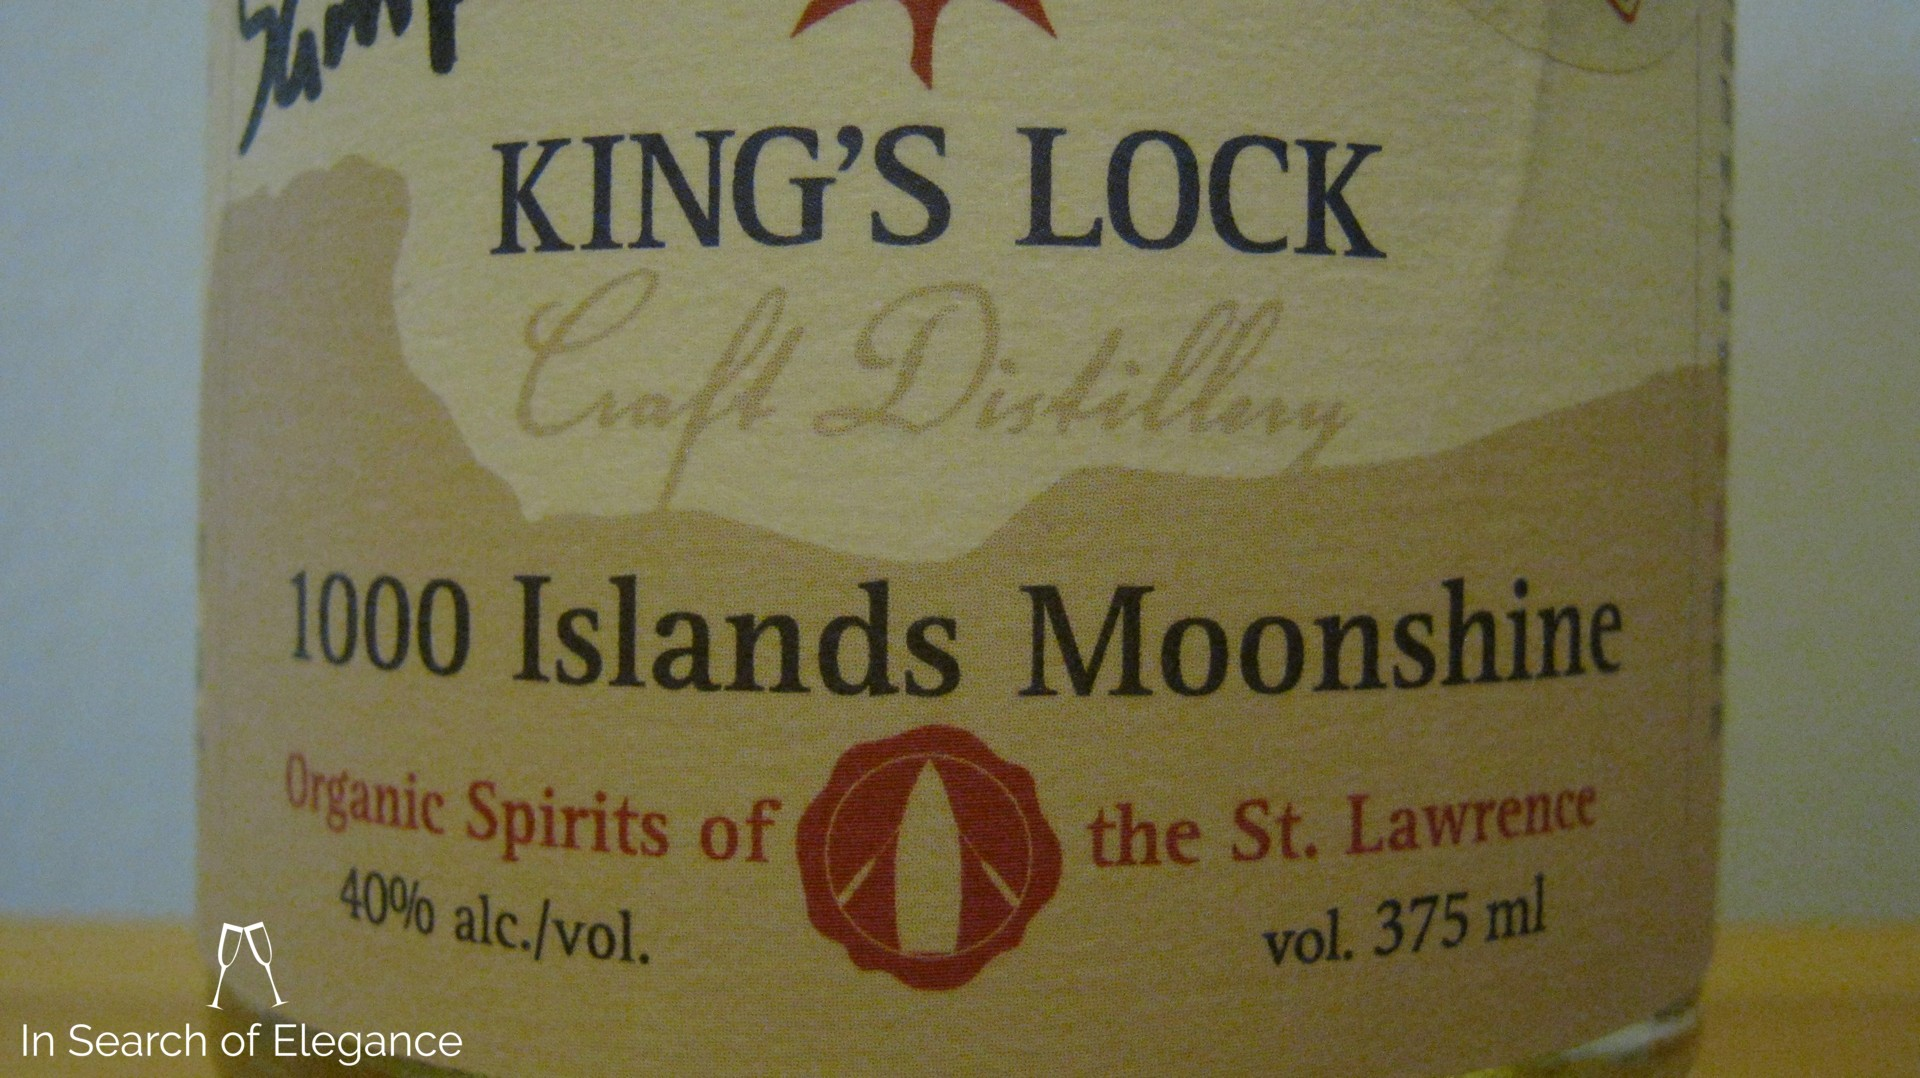 King's Lock Moonshine.jpg